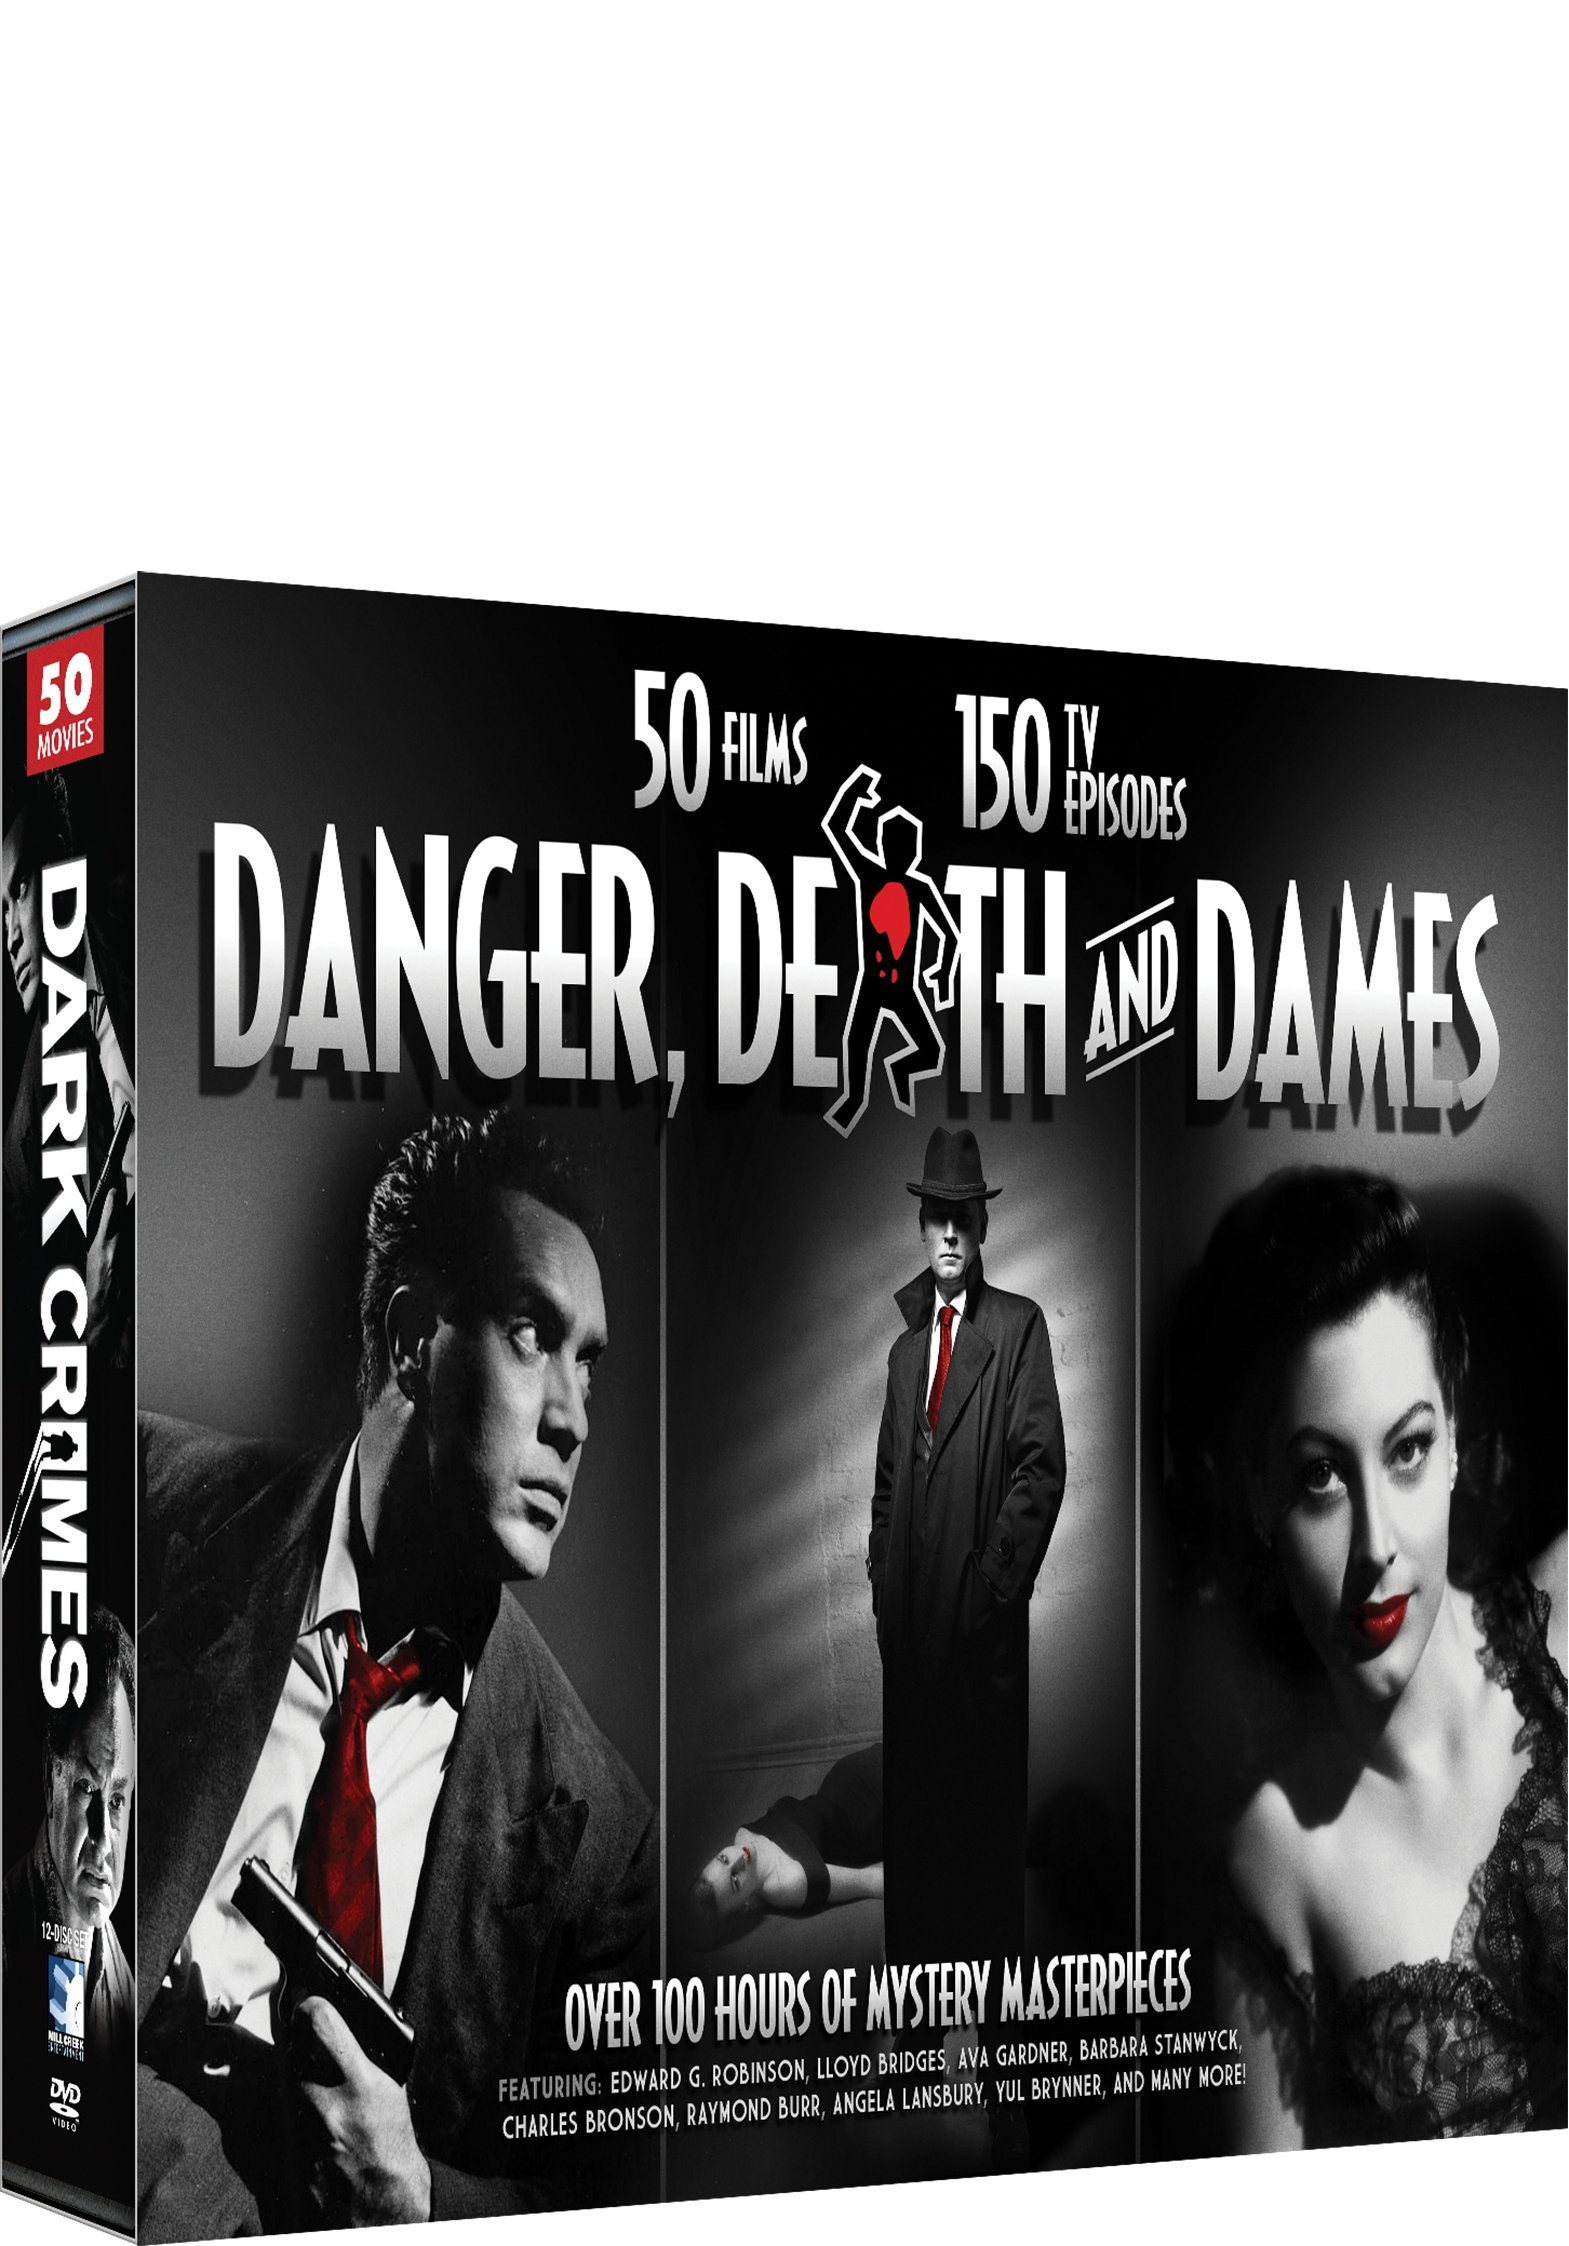 Danger, Death, and Dames - Film & TV Crime Dramas